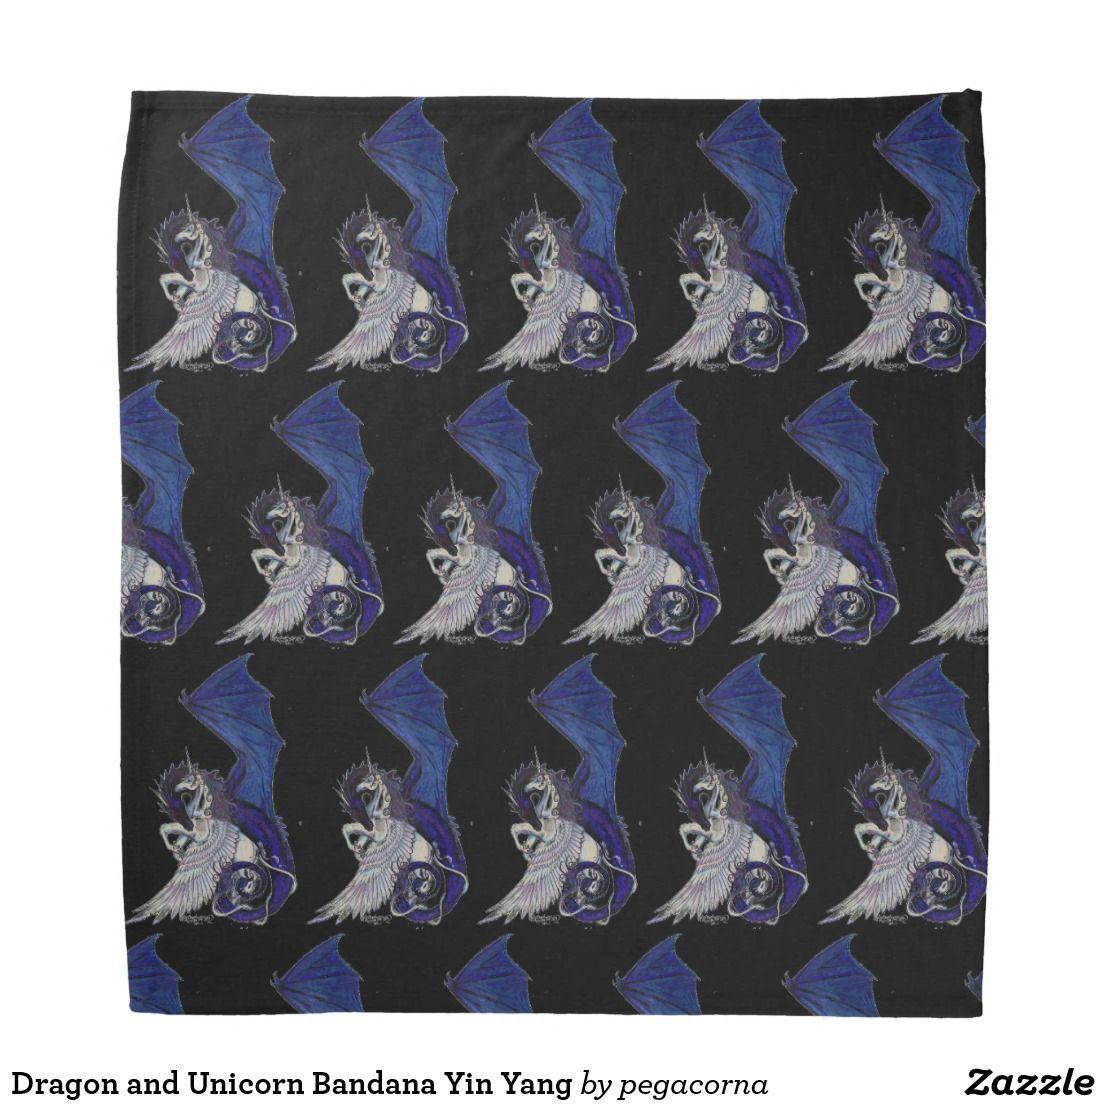 dragon and unicorn bandana yin yang with images